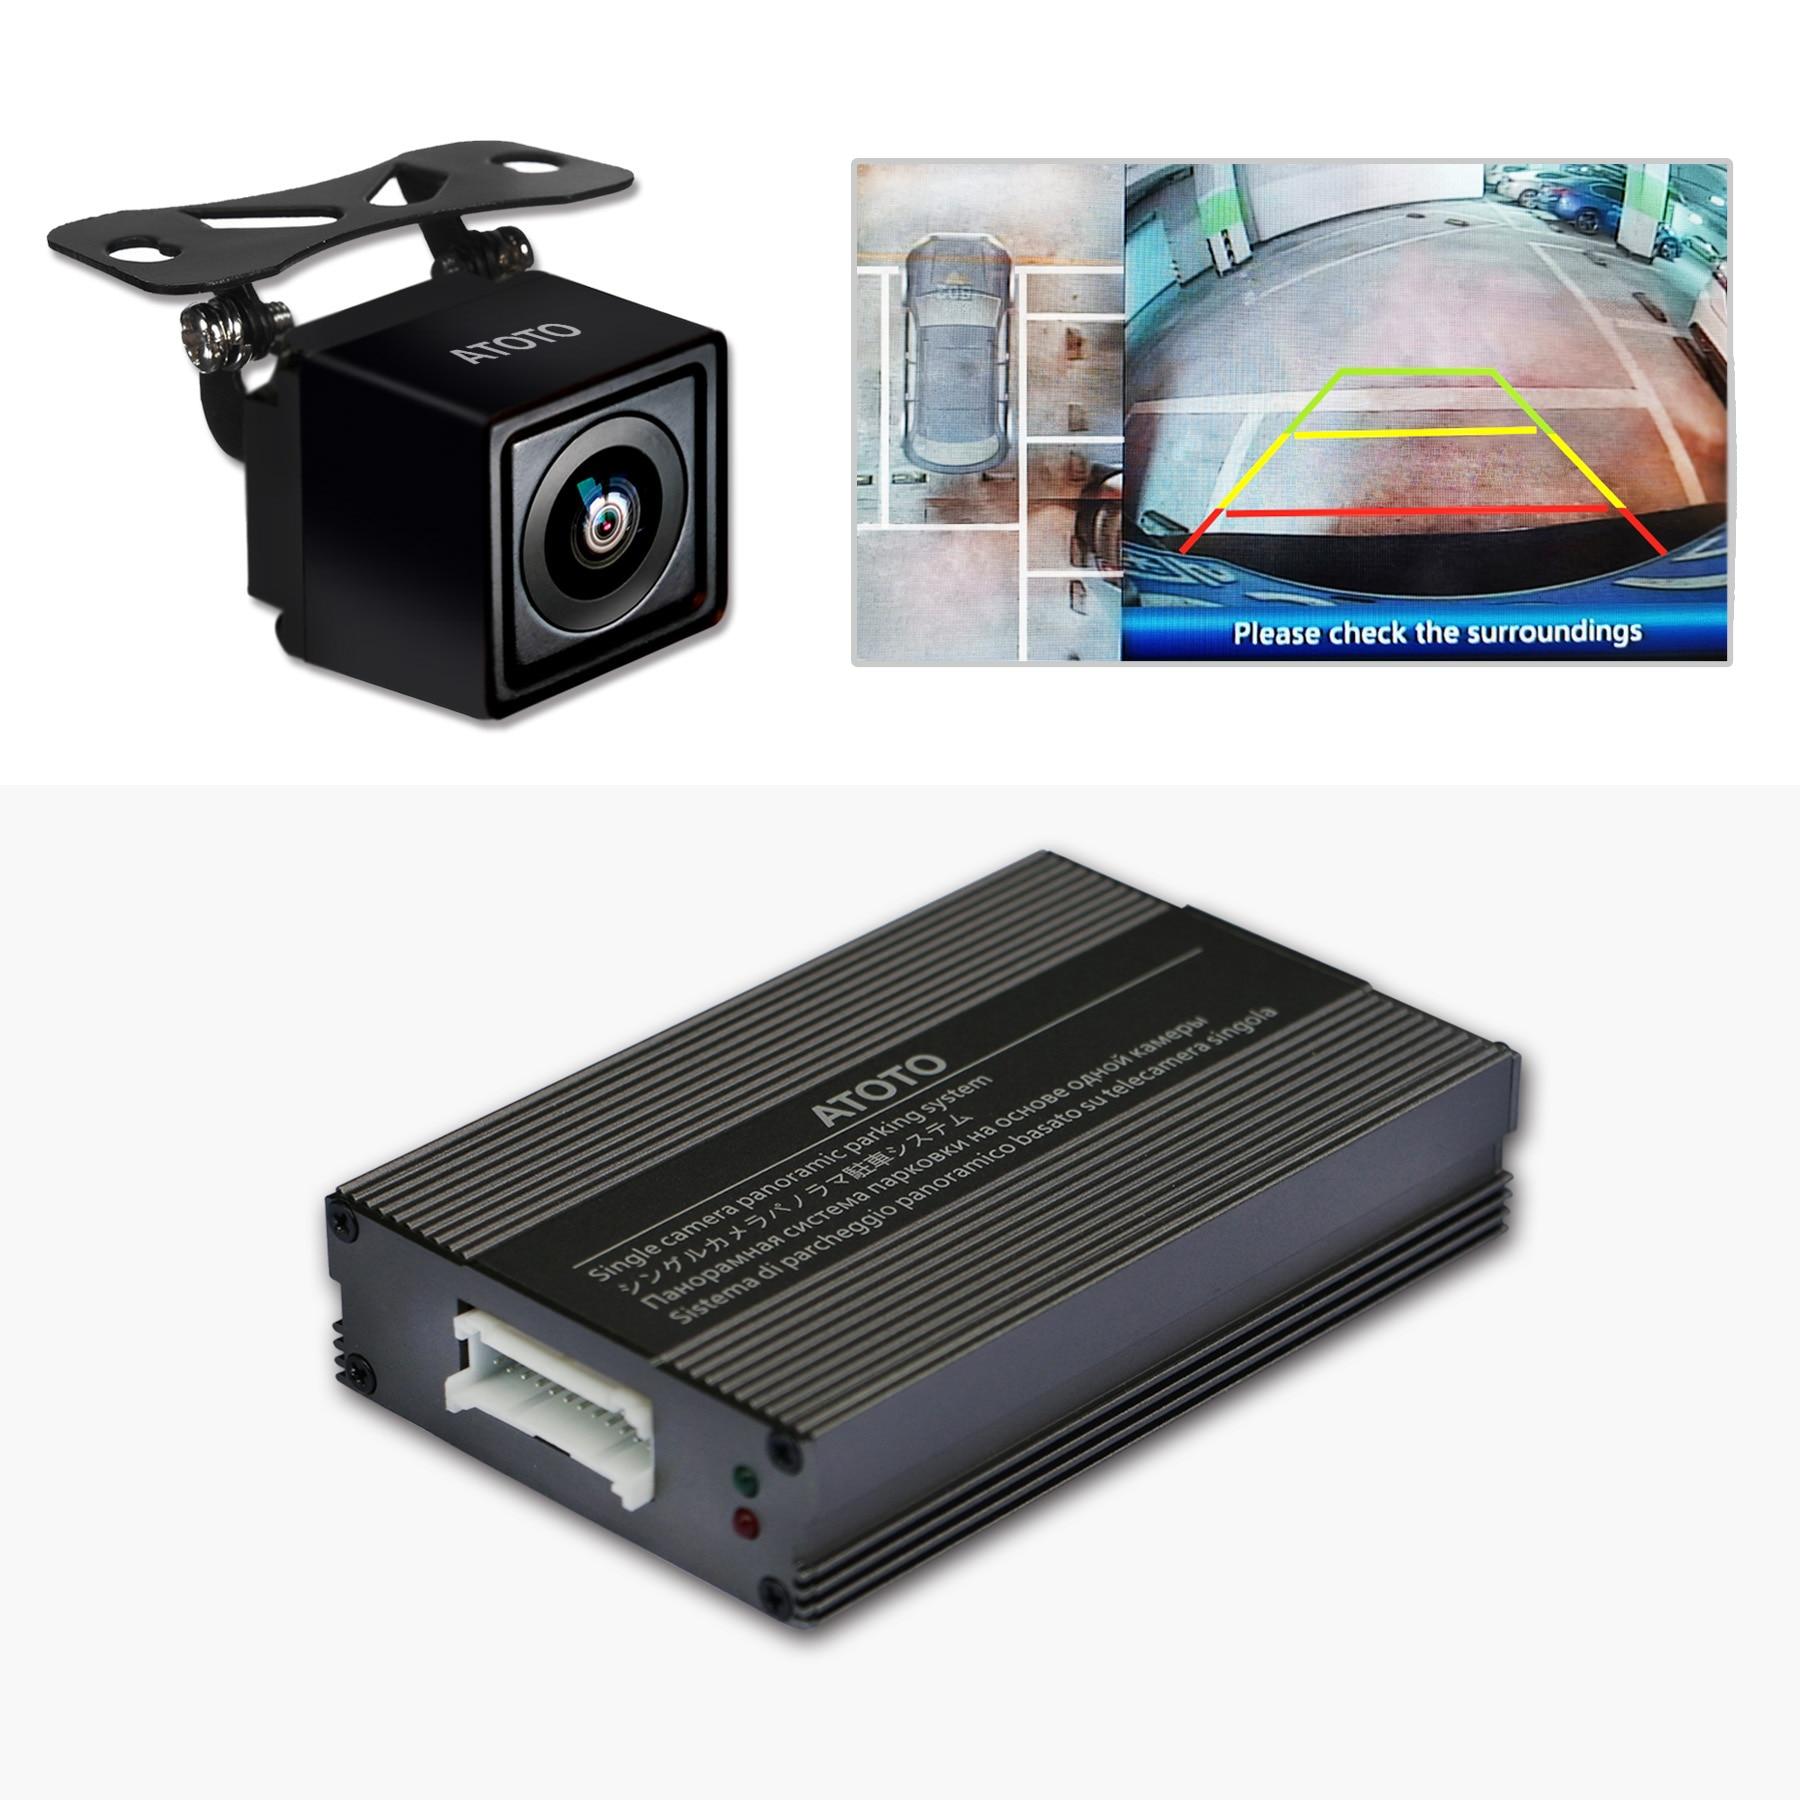 Atoto AC-SC3601 싱글 카메라 서라운드 뷰 리어 뷰 주차 시스템-파노라마 이미지 스티칭-주변의 새의 눈보기